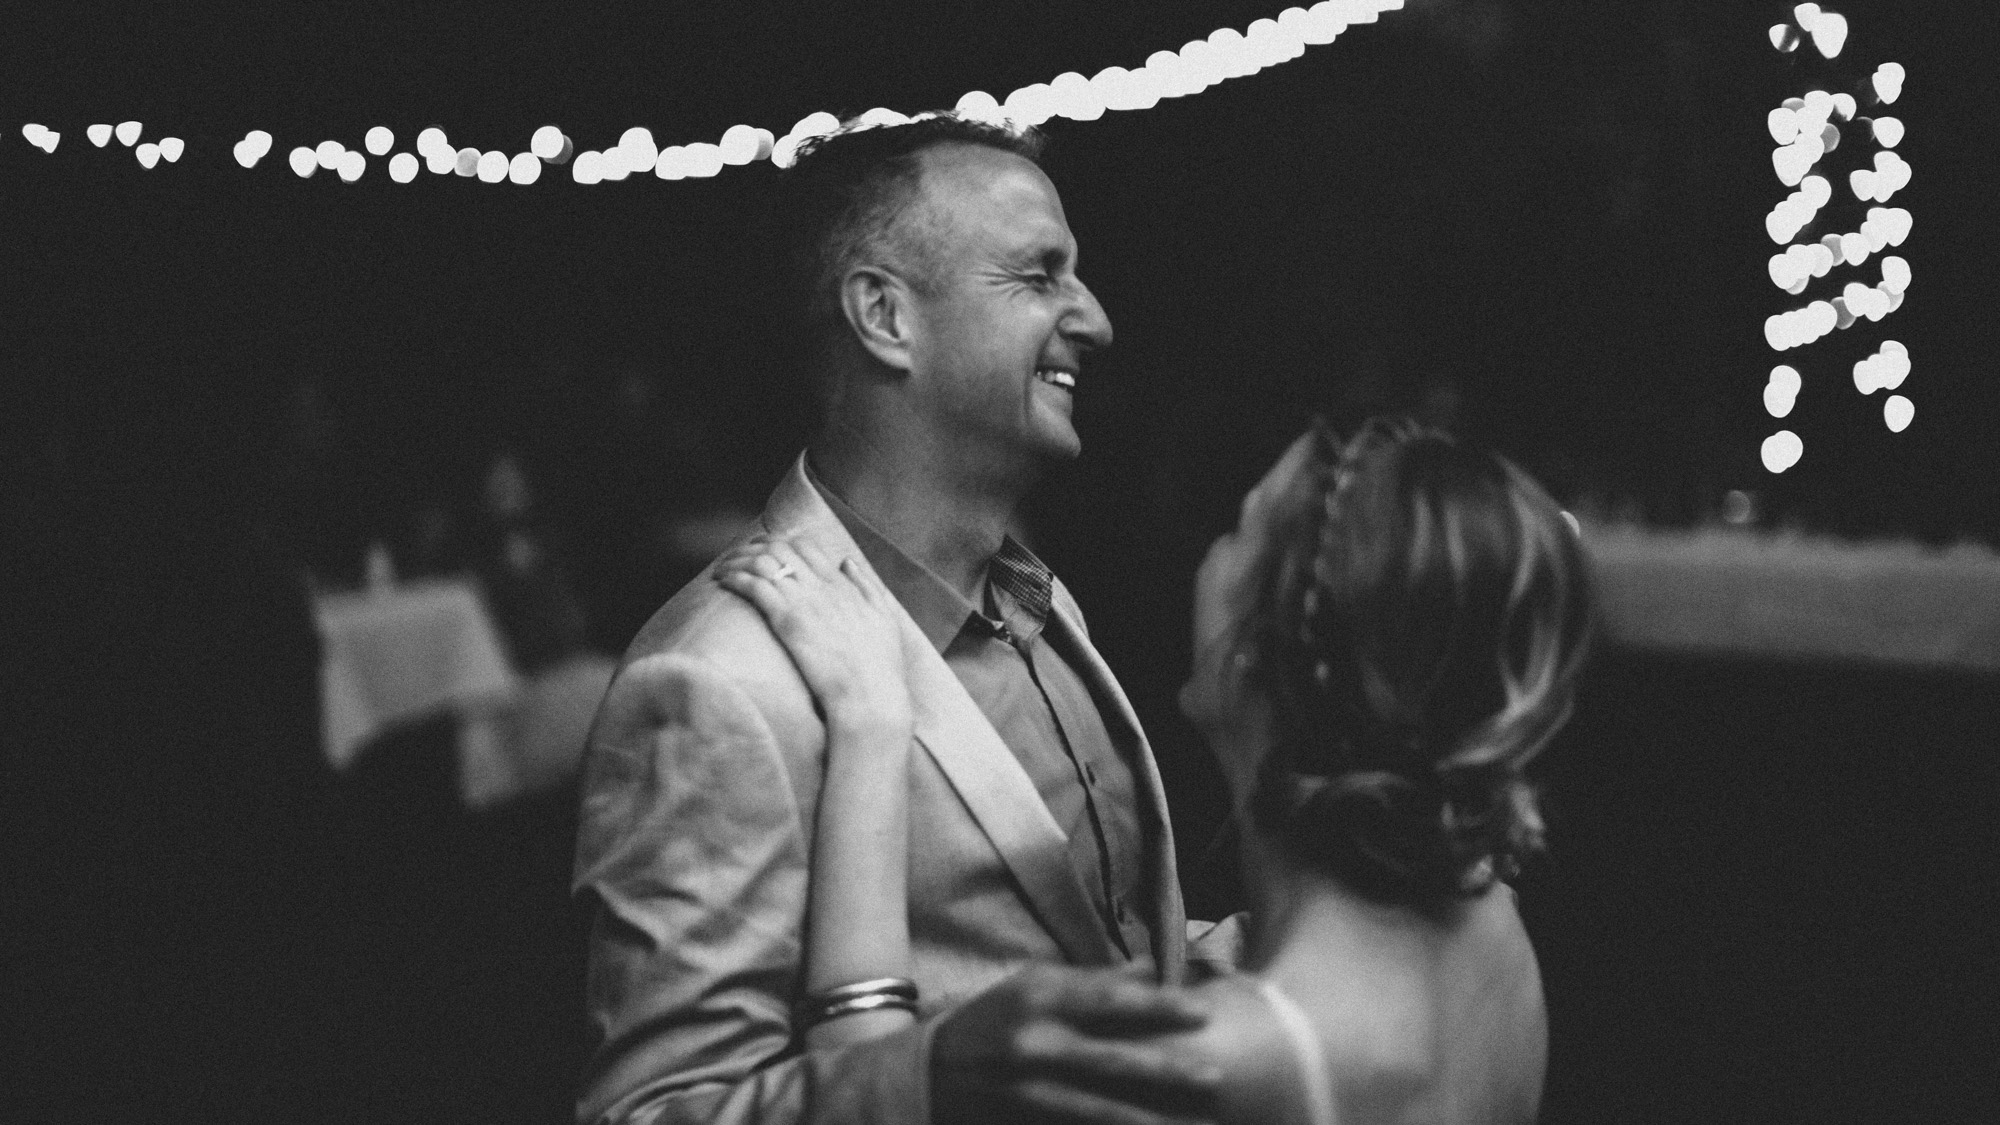 alec_vanderboom_springfield_missouri_wedding-0087.jpg